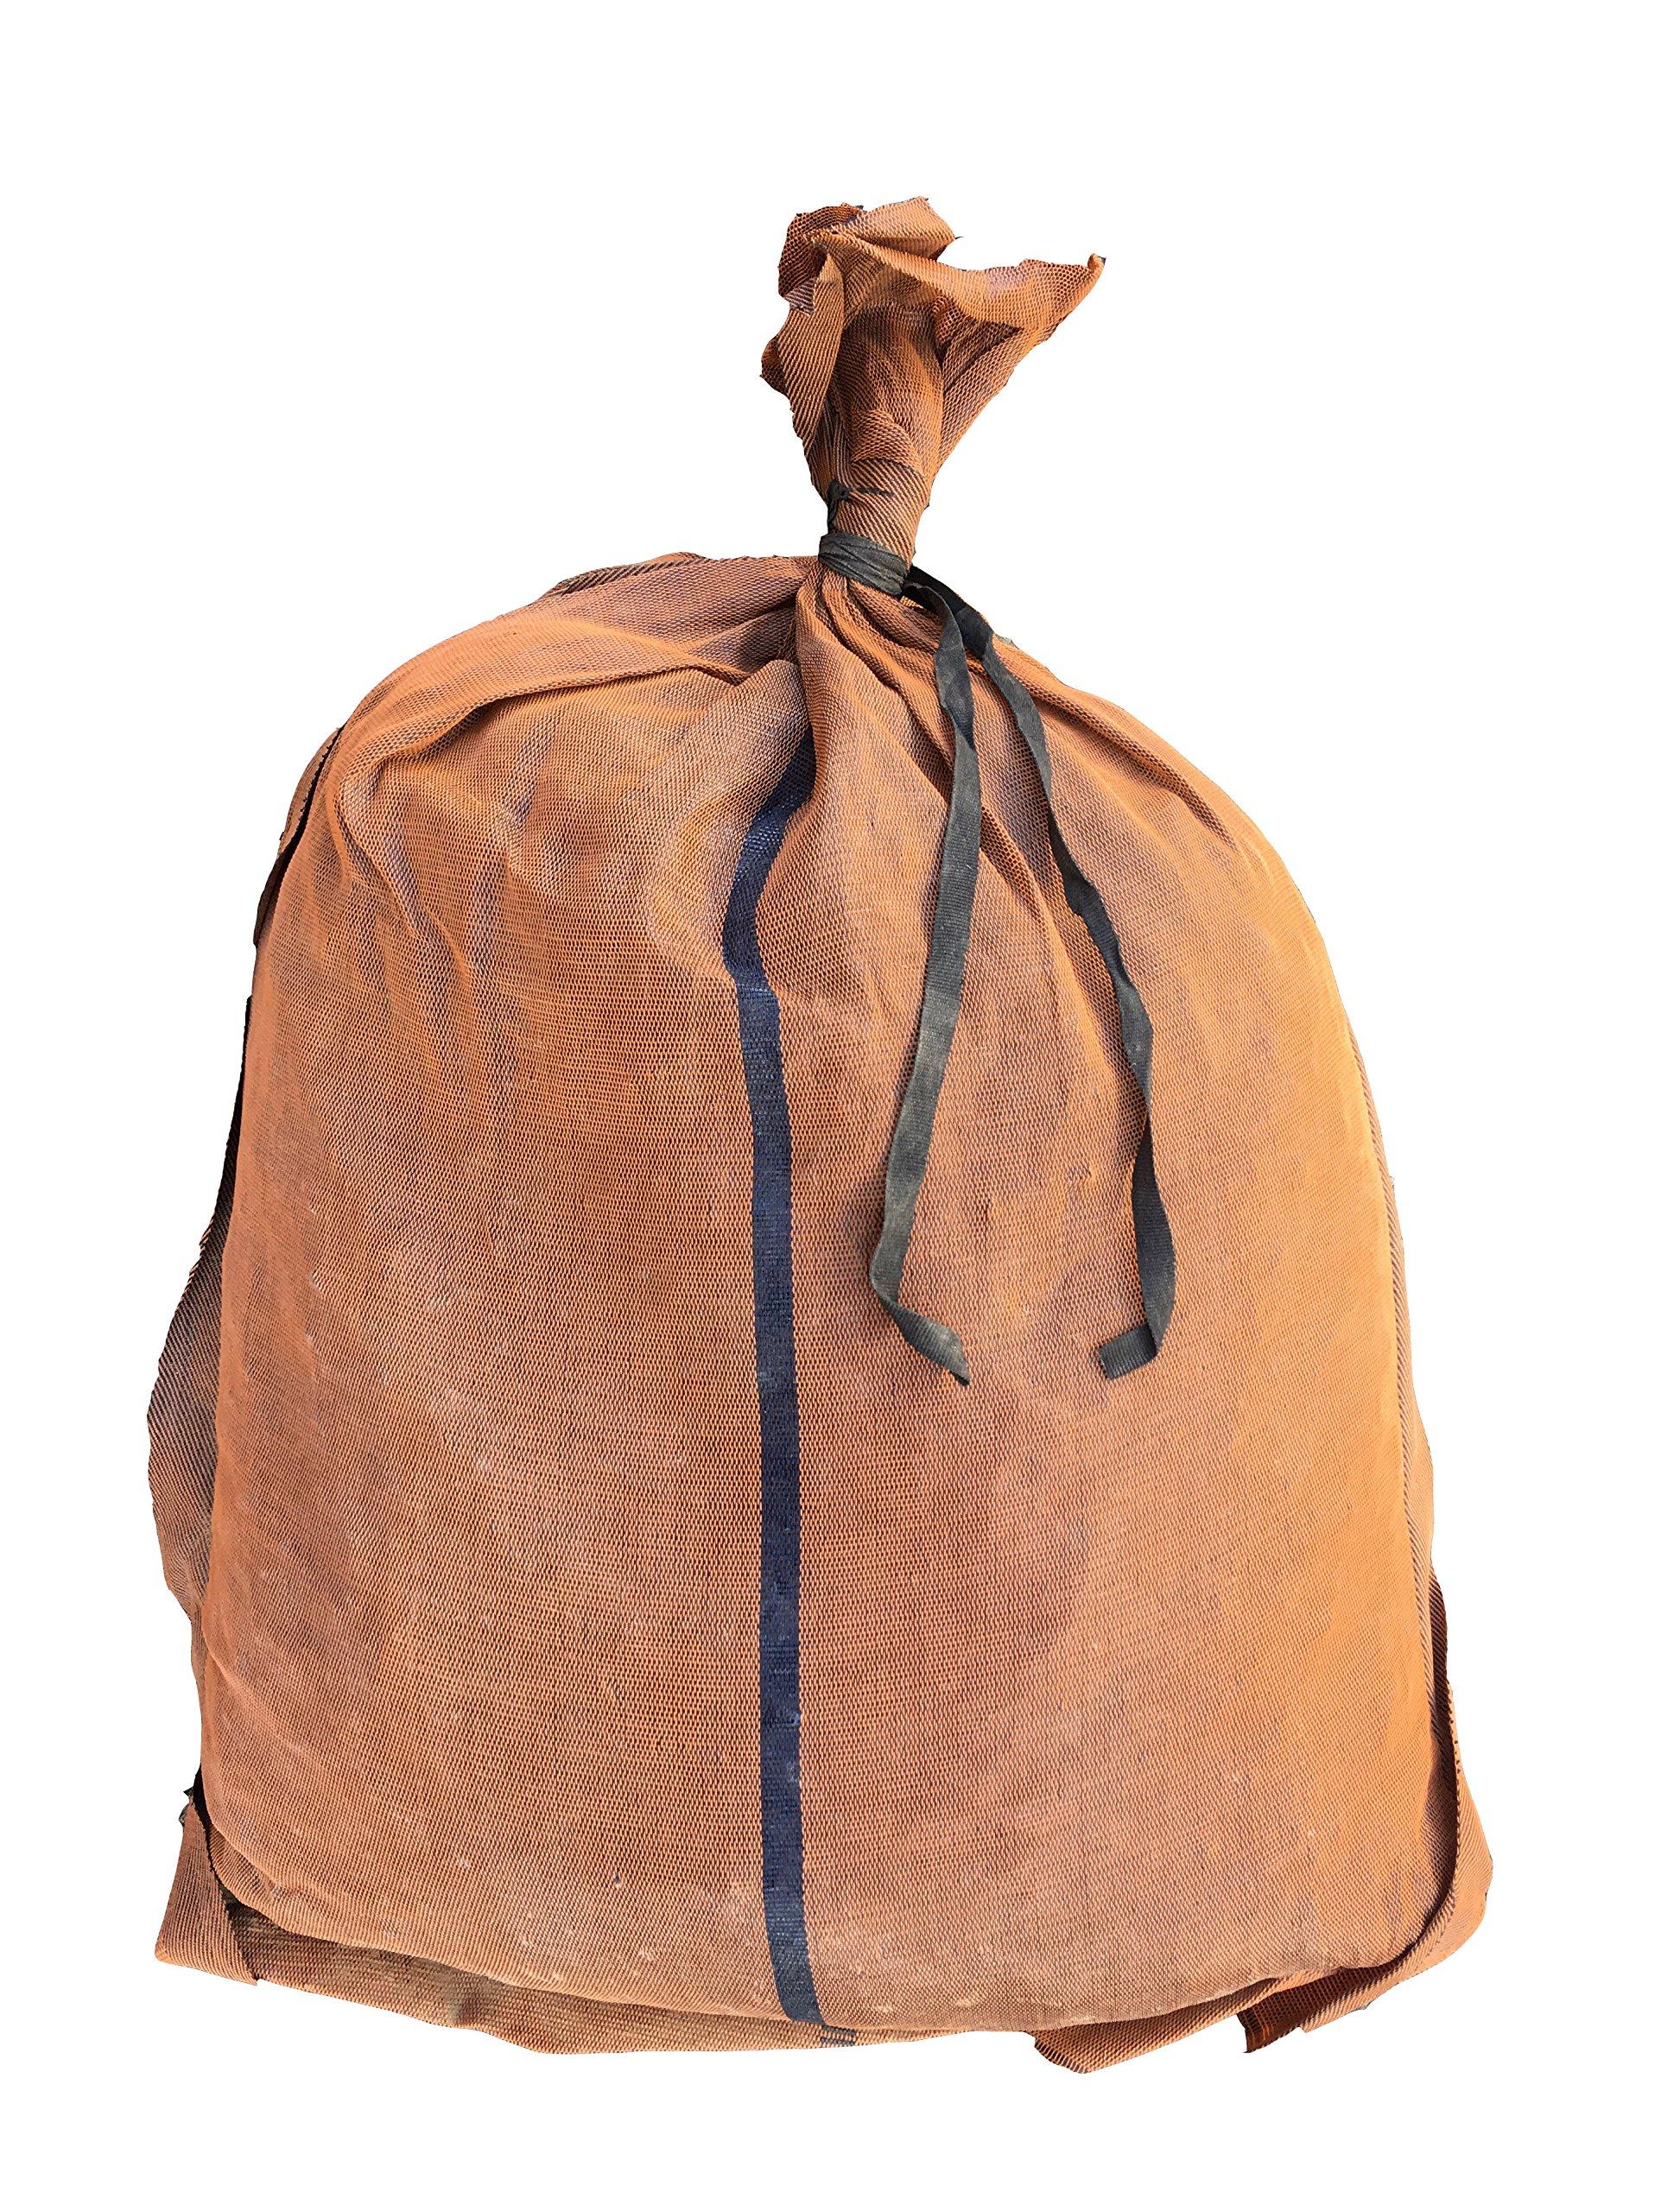 "Sandbaggy - 17"" x 27"" Long-Lasting Sandbags - Brown Color - Lasts 1-2 Yrs - Monofilament - Sandbags for Flooding - Sand Bag - Flood Water Barrier - Water Curb - Tent Sandbags - Store Bag (Pack of 500)"